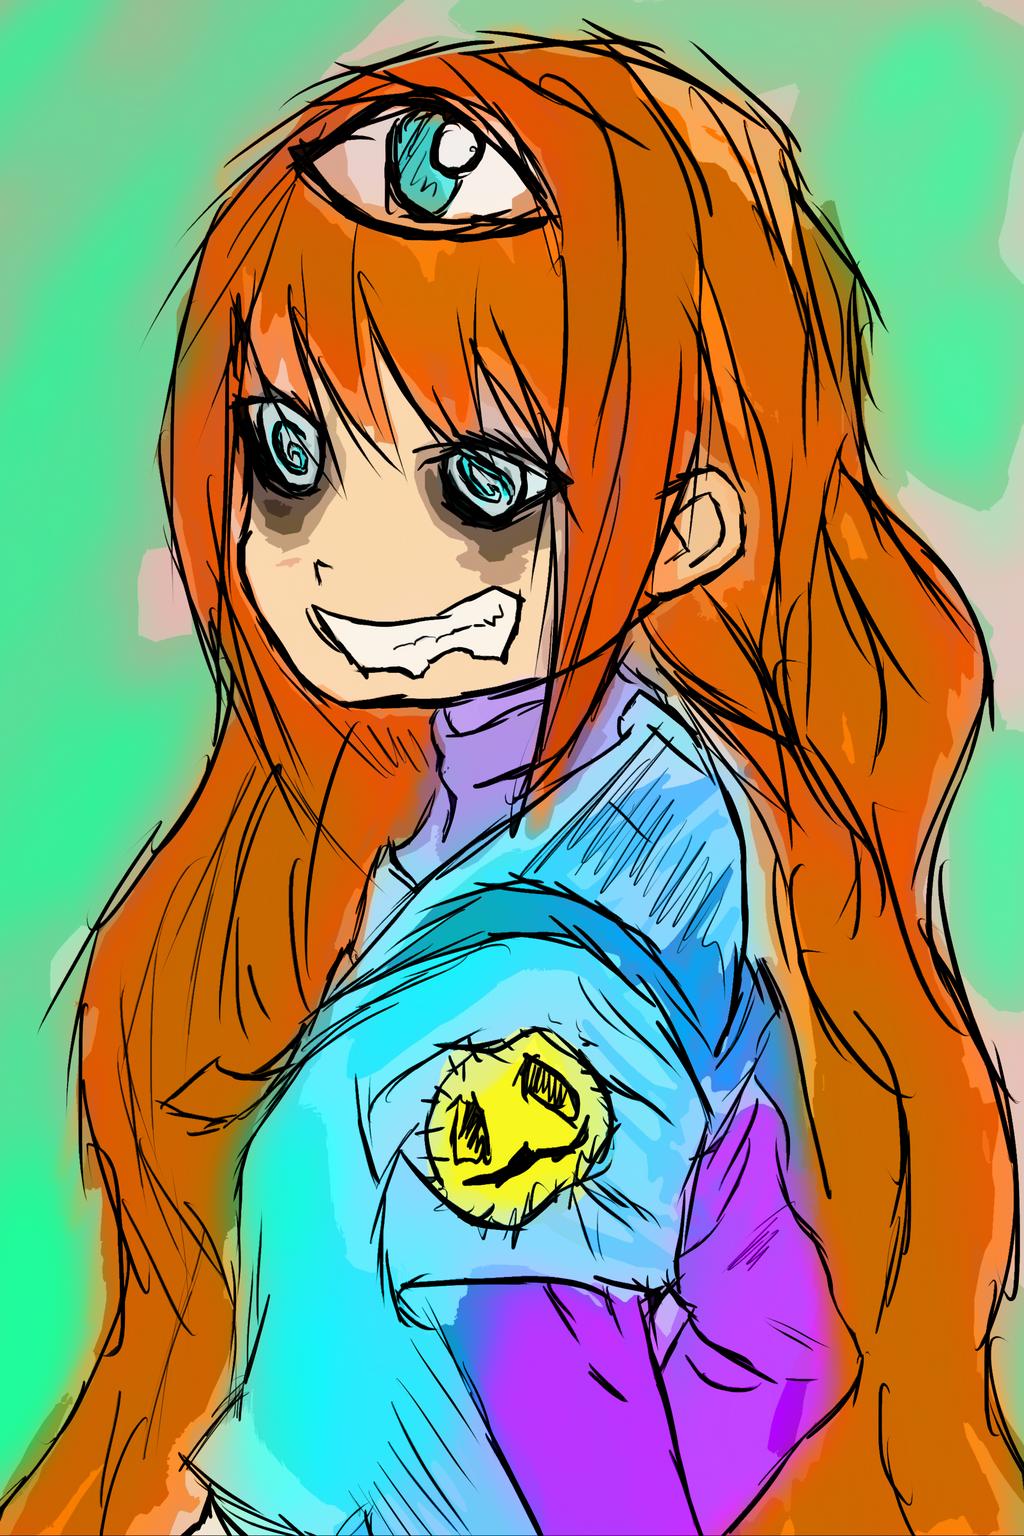 Smile Girl by JayceRan